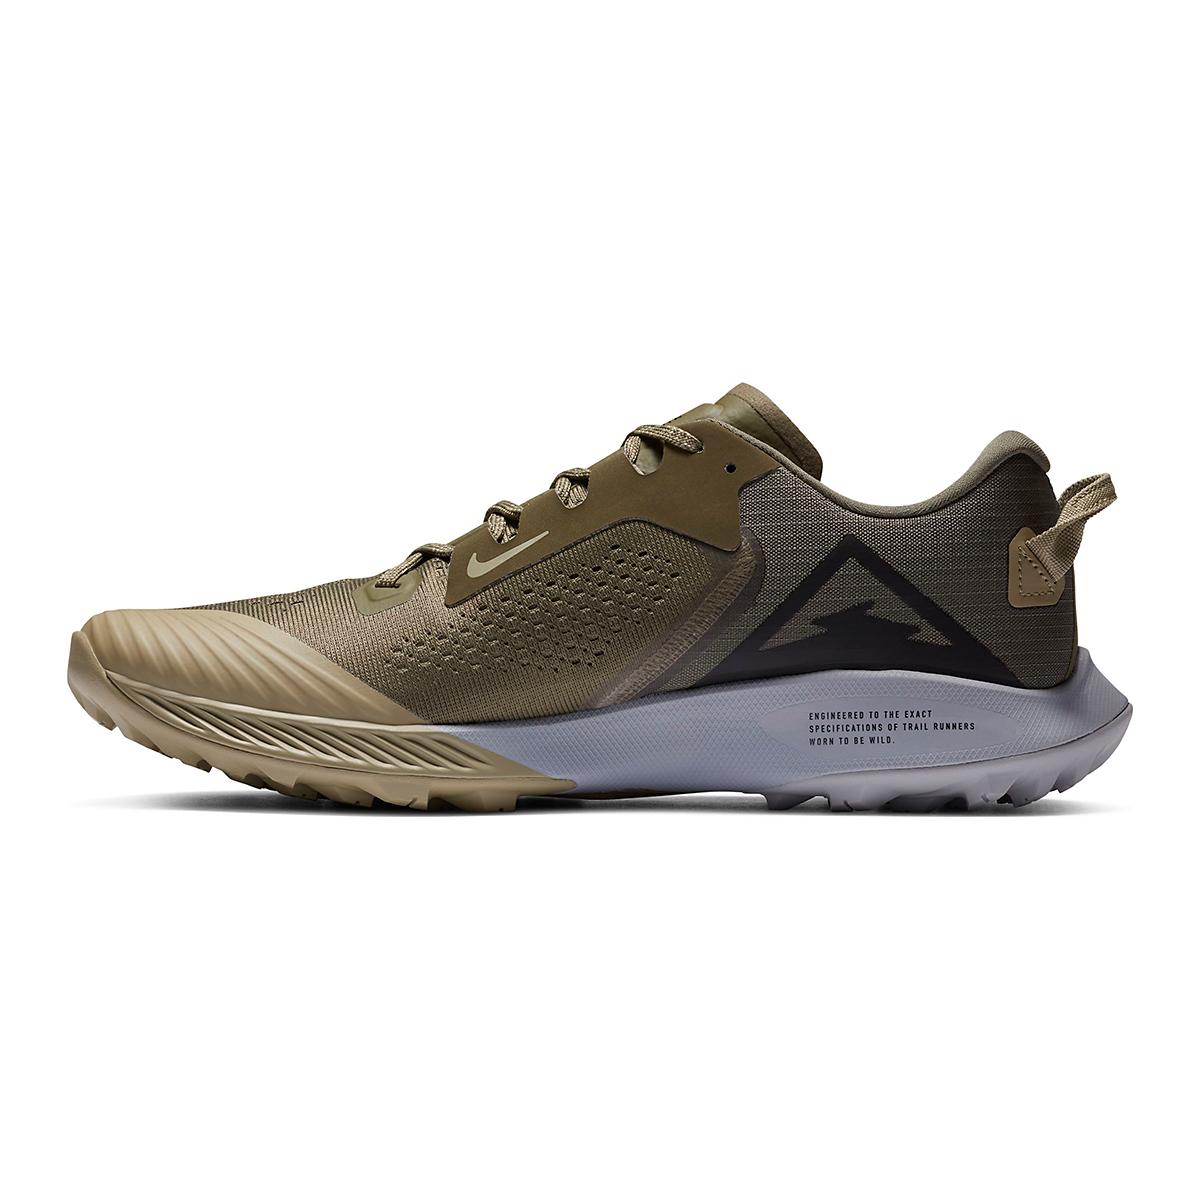 Men's Nike Air Zoom Terra Kiger 6 Trail Running Shoe - Color: Medium Olive/Medium Khaki/Wolf Grey/Black - Size: 6 - Width: Regular, Medium Olive/Medium Khaki/Wolf Grey/Black, large, image 4